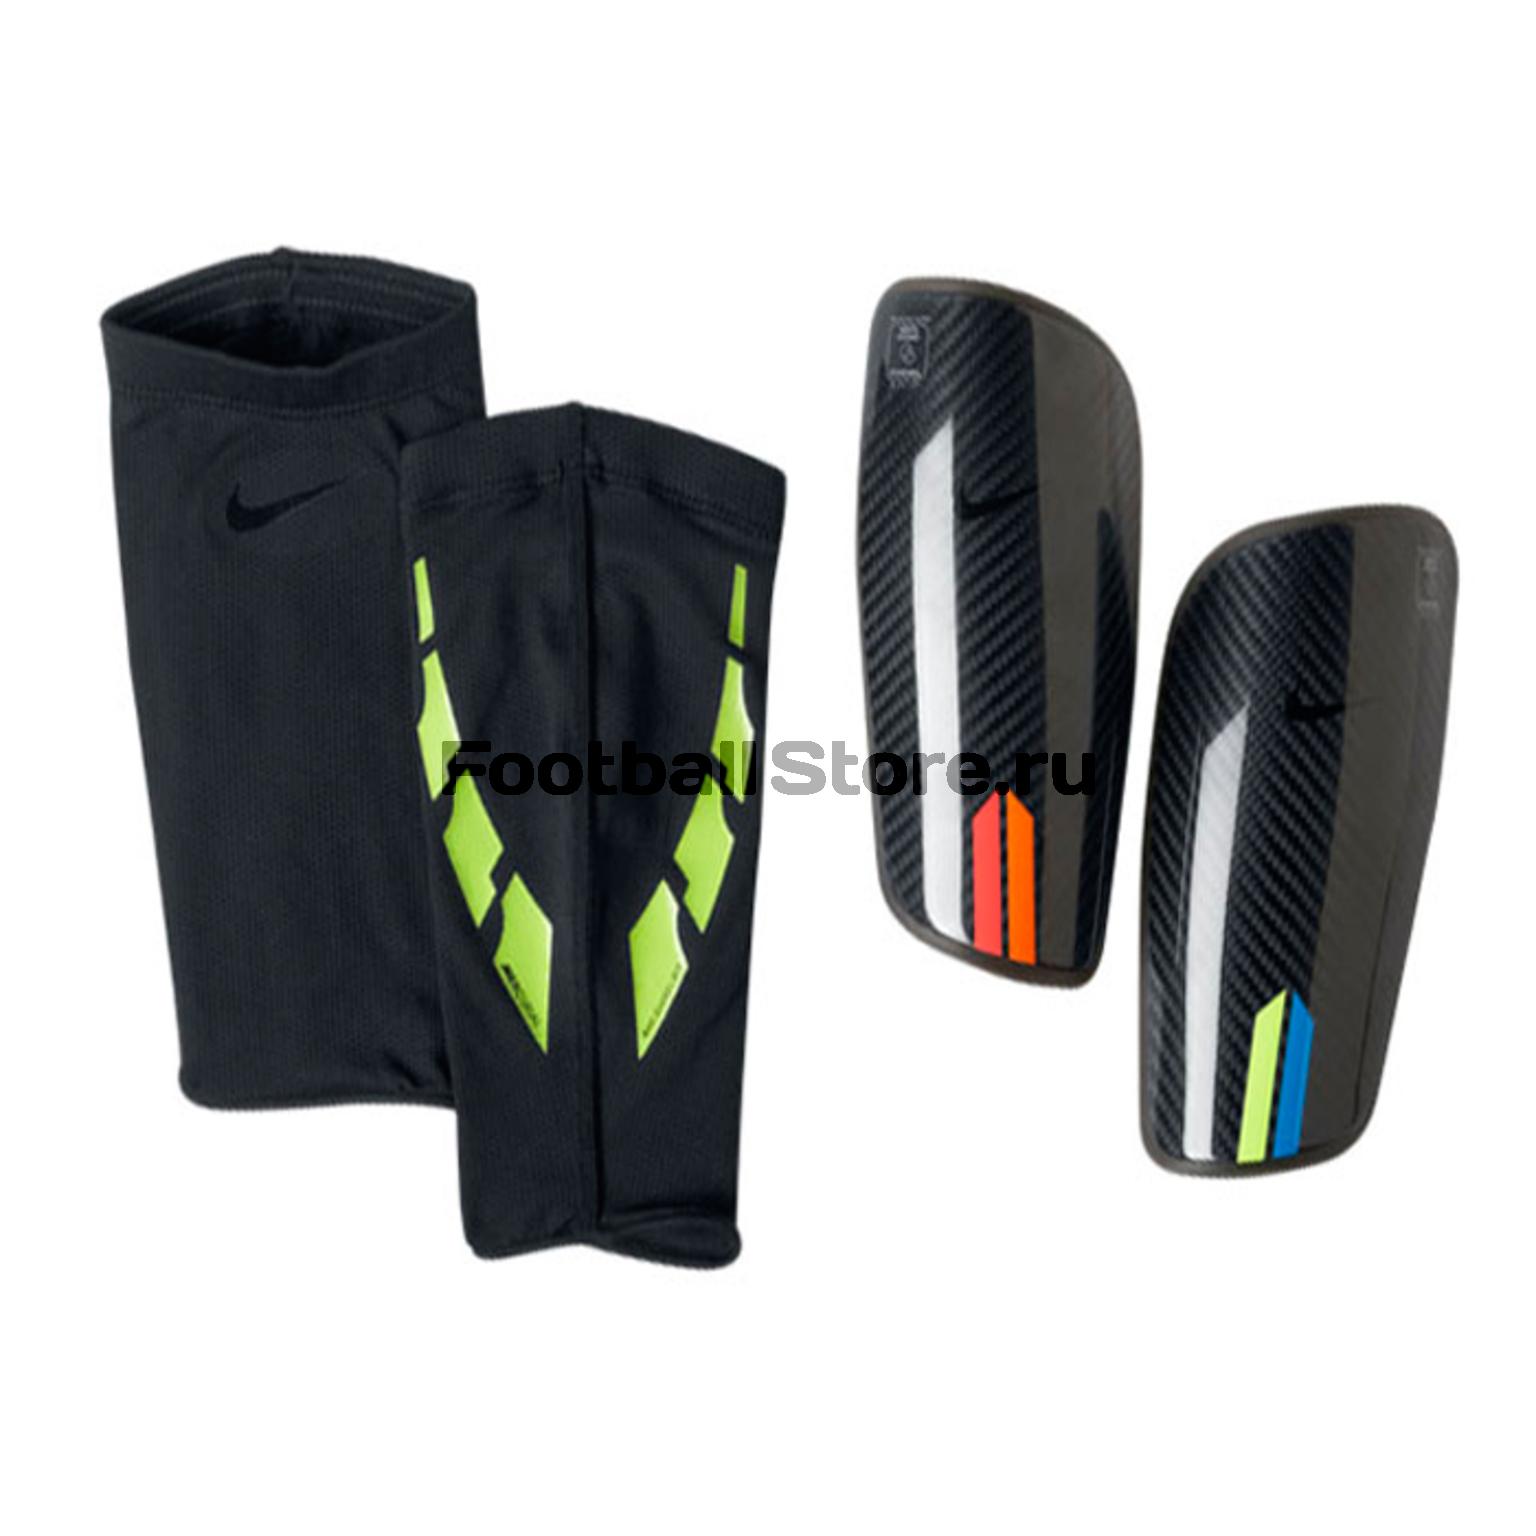 Защита ног Nike Щитки Nike Mercurial Blade SP0246-080